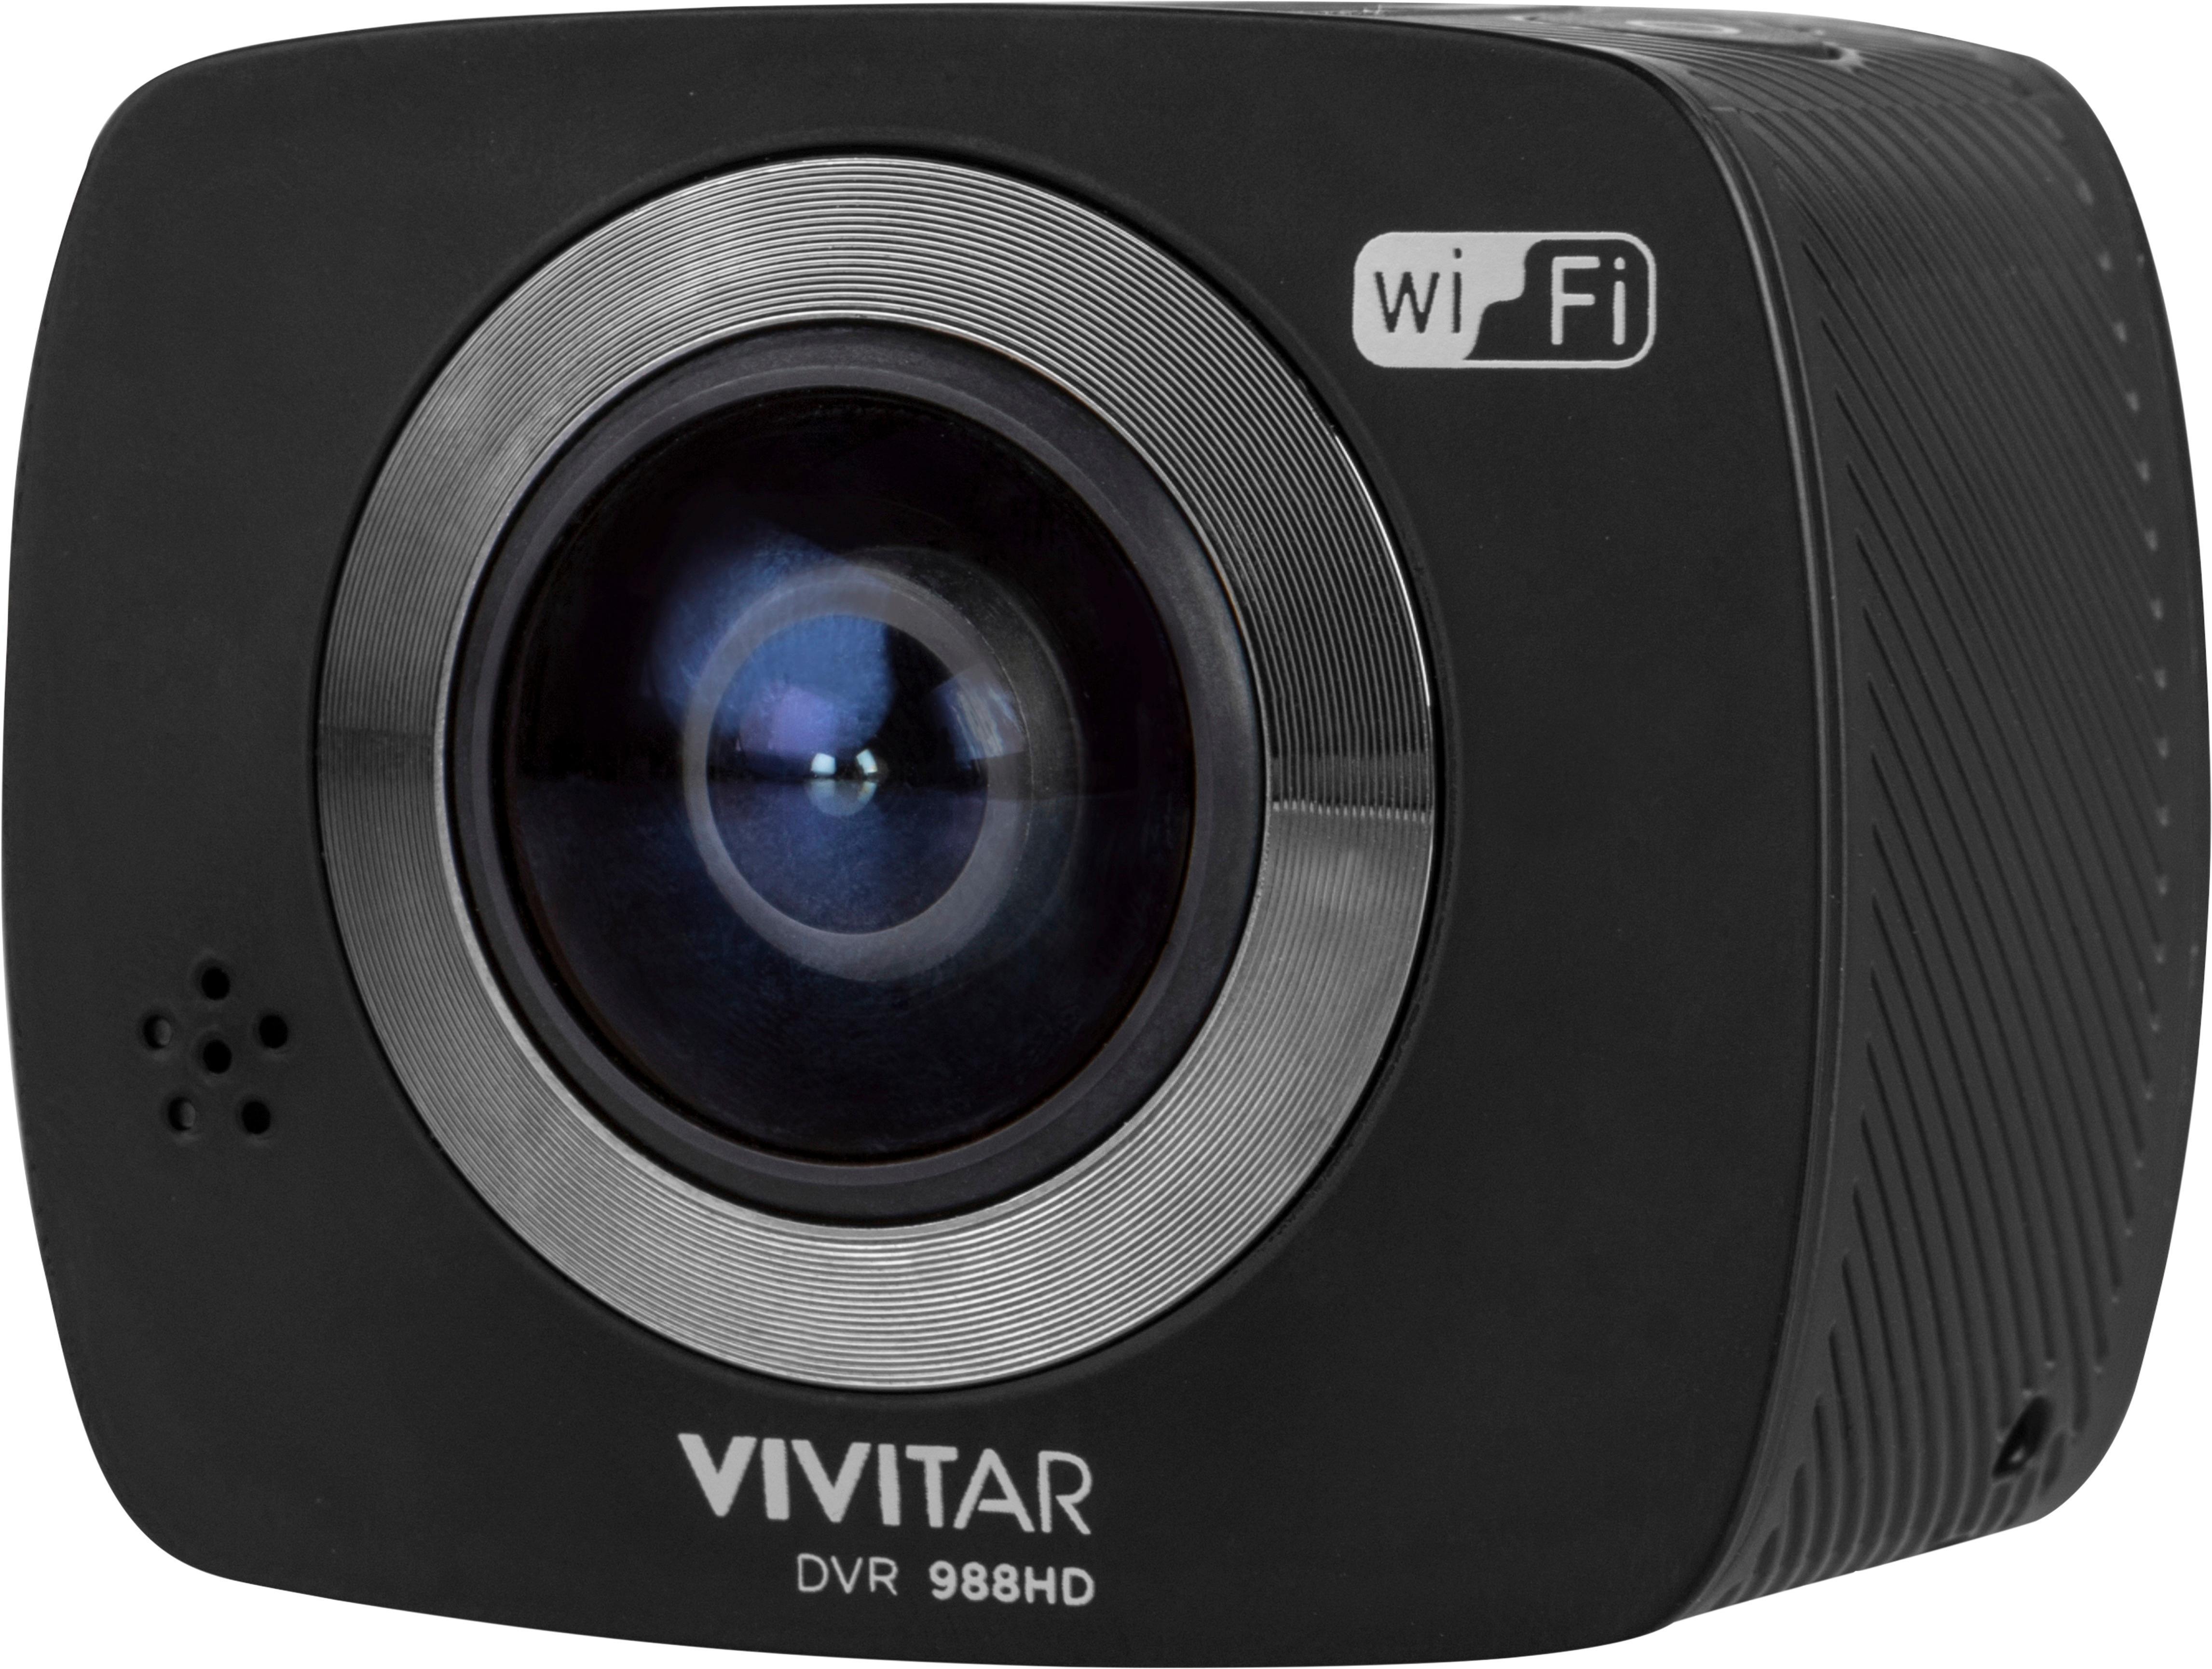 Vivitar 360 Degree Action Camera Black DVR988HD - Best Buy